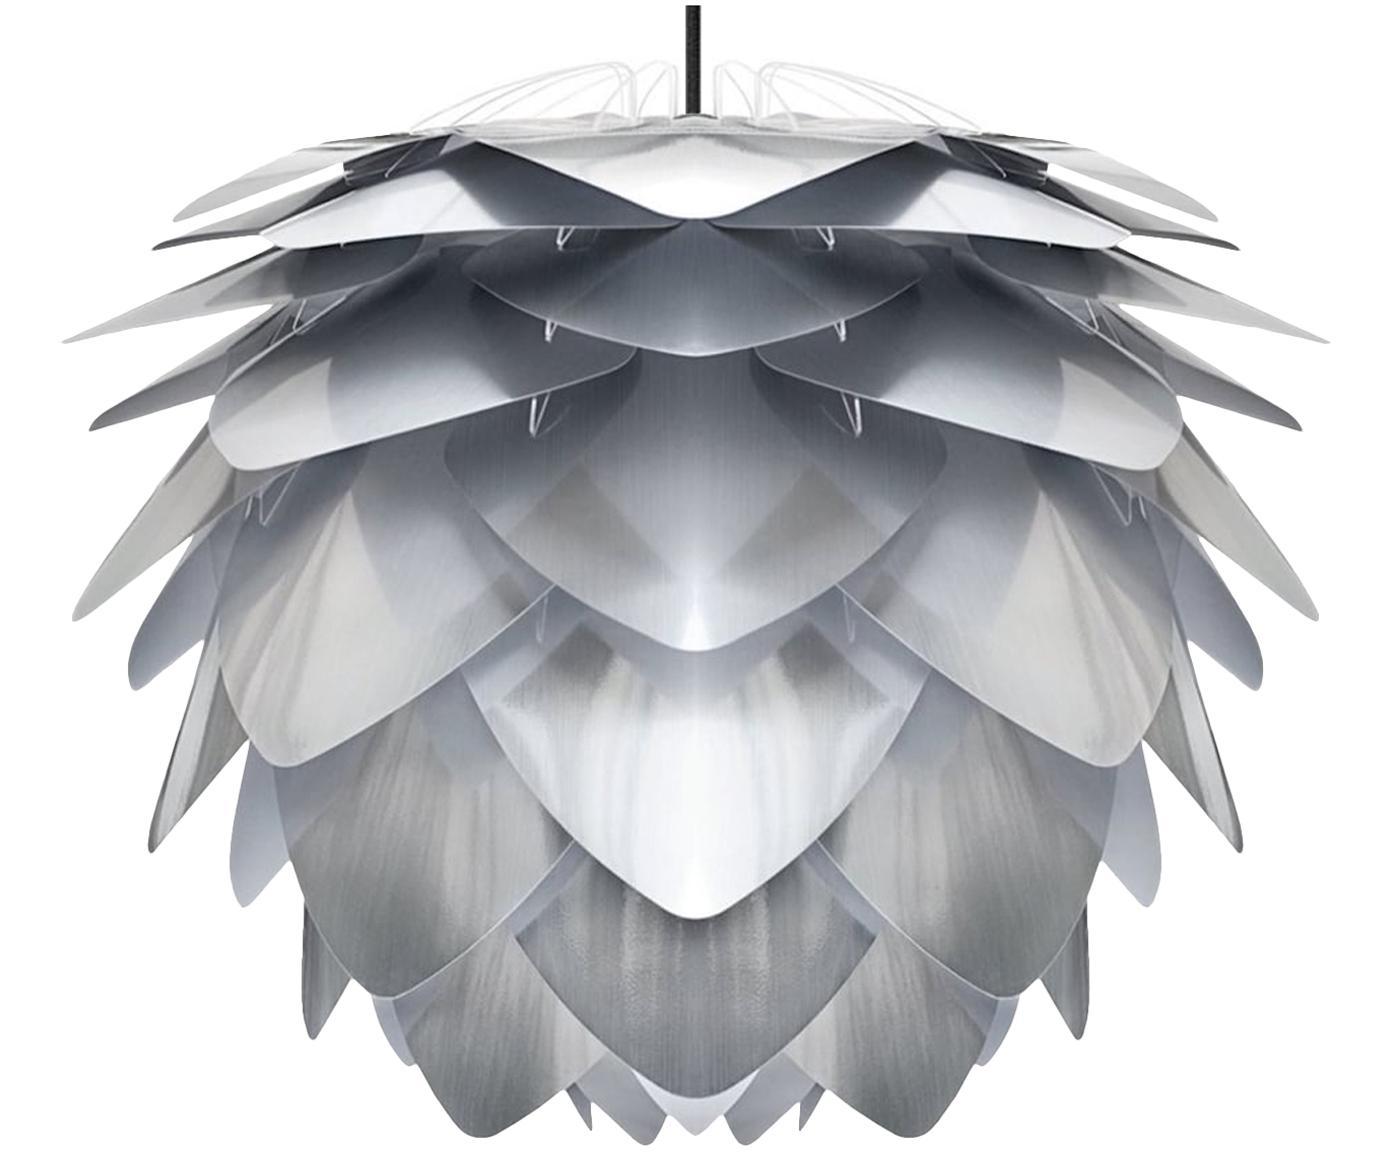 Pendelleuchte Silvia, Bausatz, Lampenschirm: Polypropylen, Stahlfarben, Ø 32 x H 25 cm